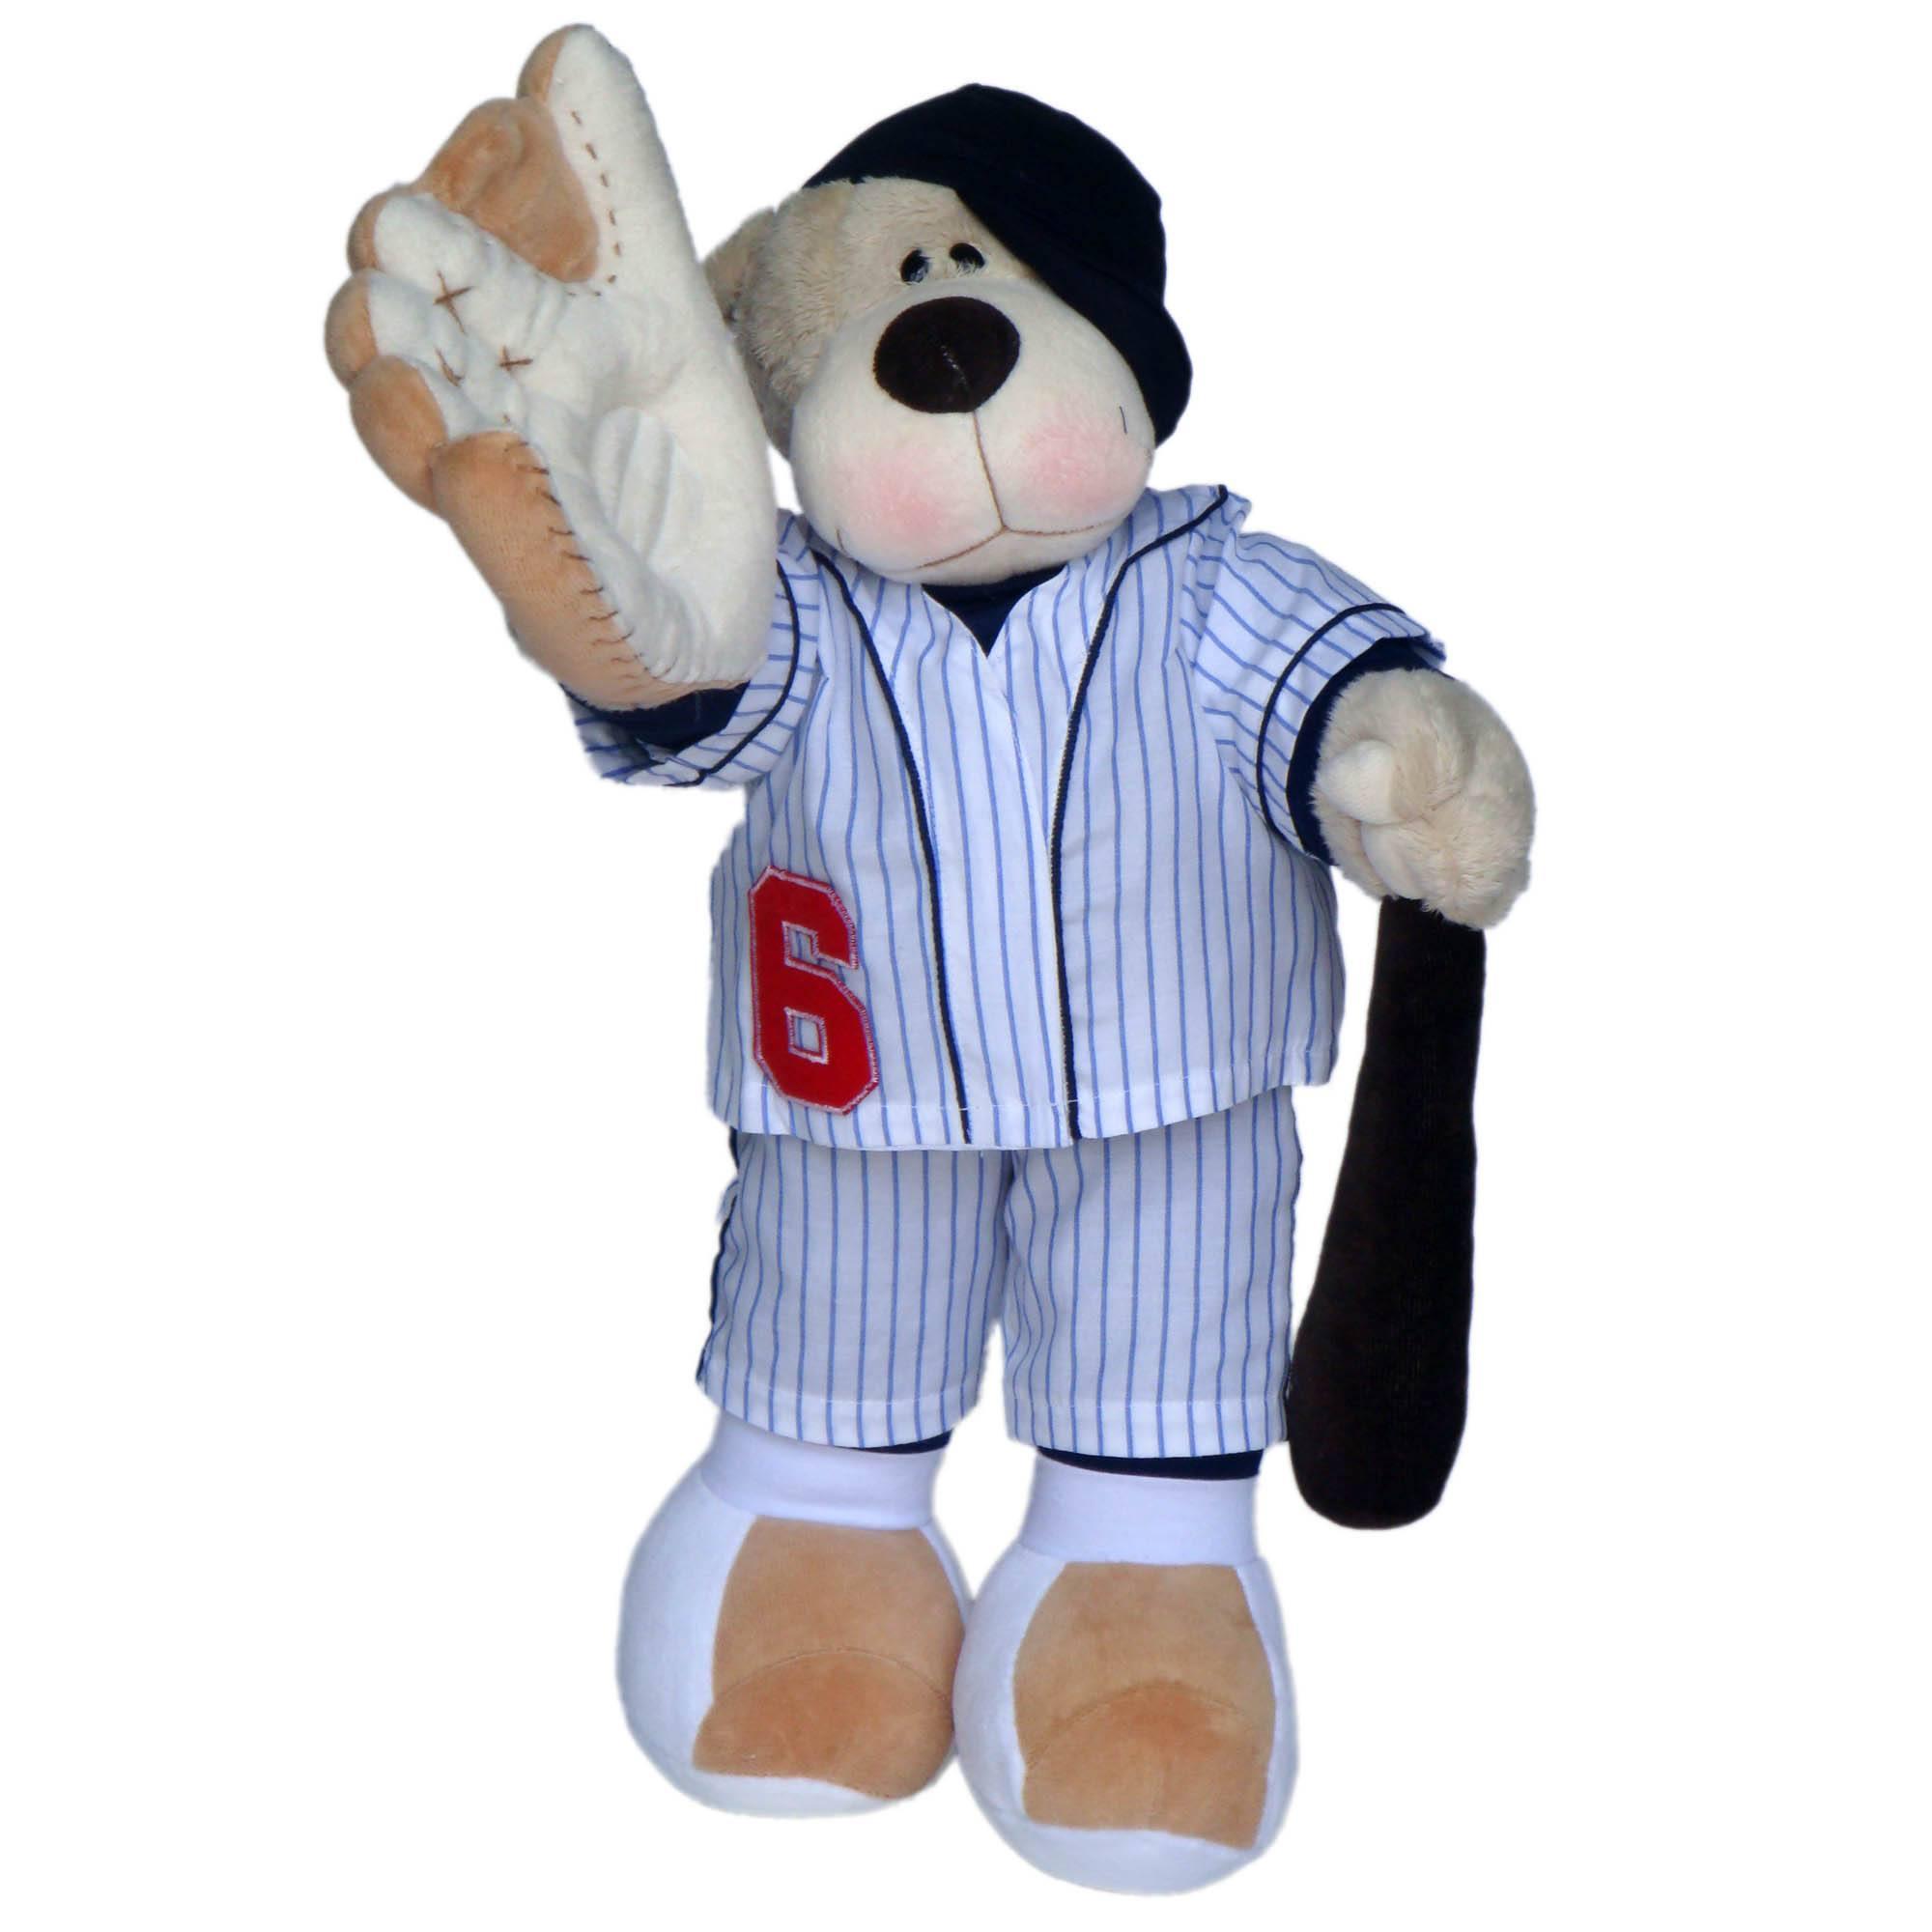 Urso Pelucia Bochecha Baseball - Silvia Polito